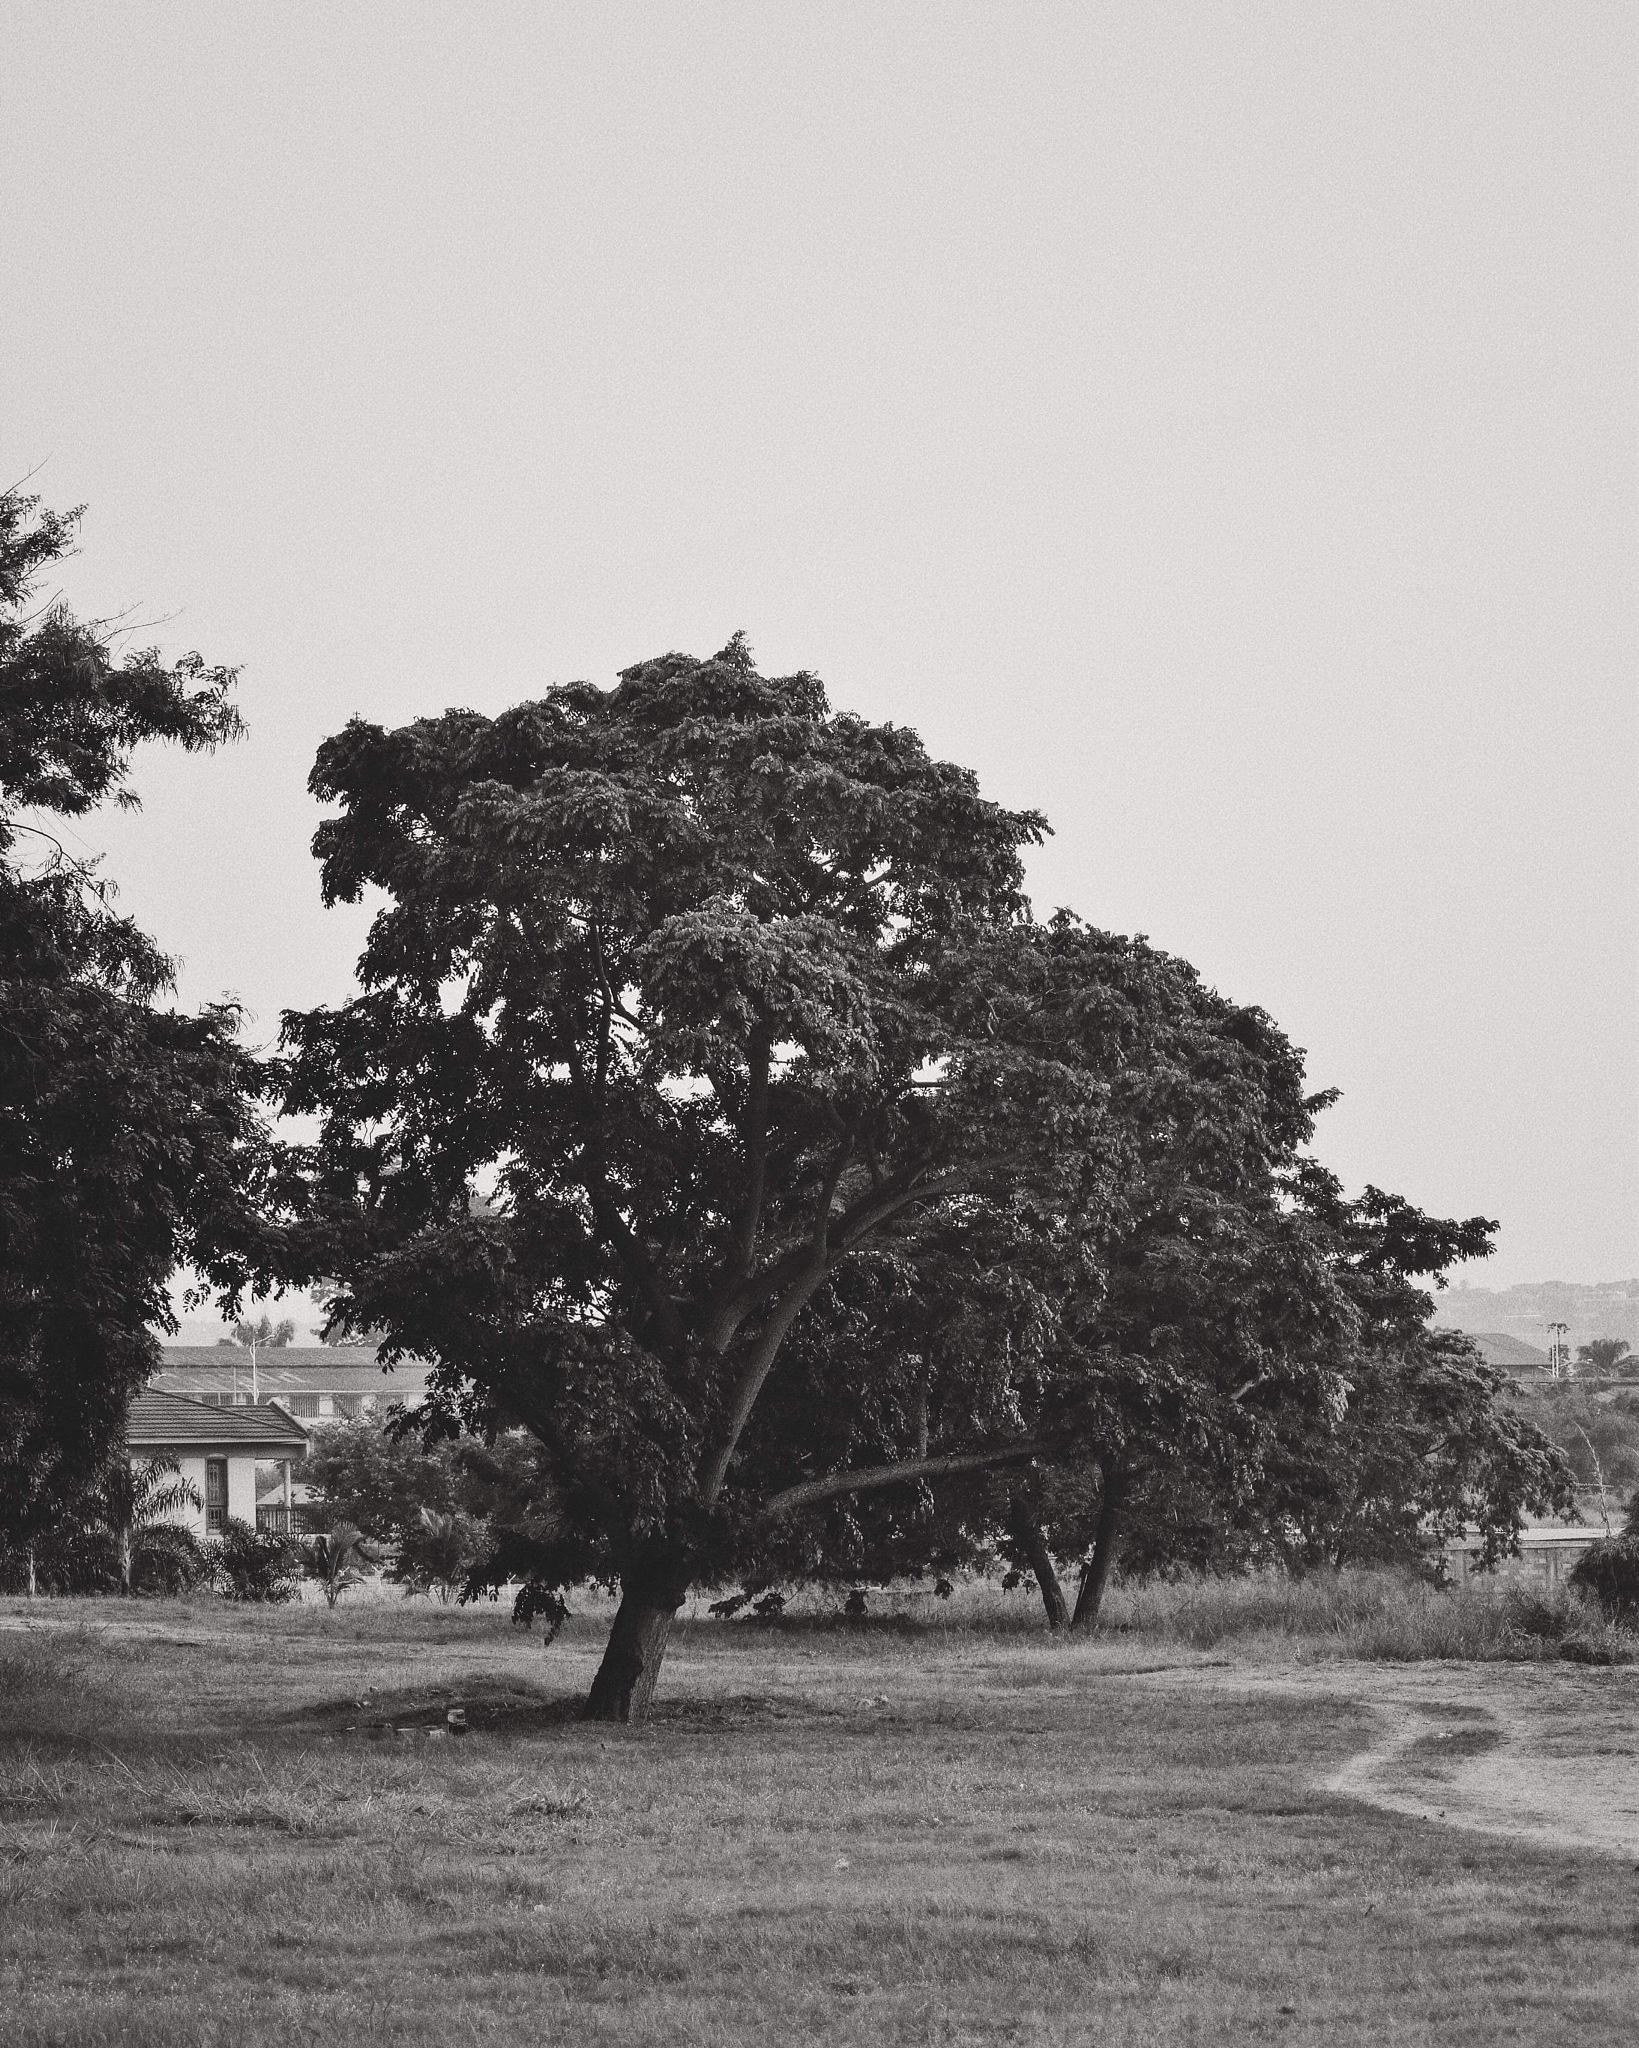 monochrome tree by Badr Bensaid